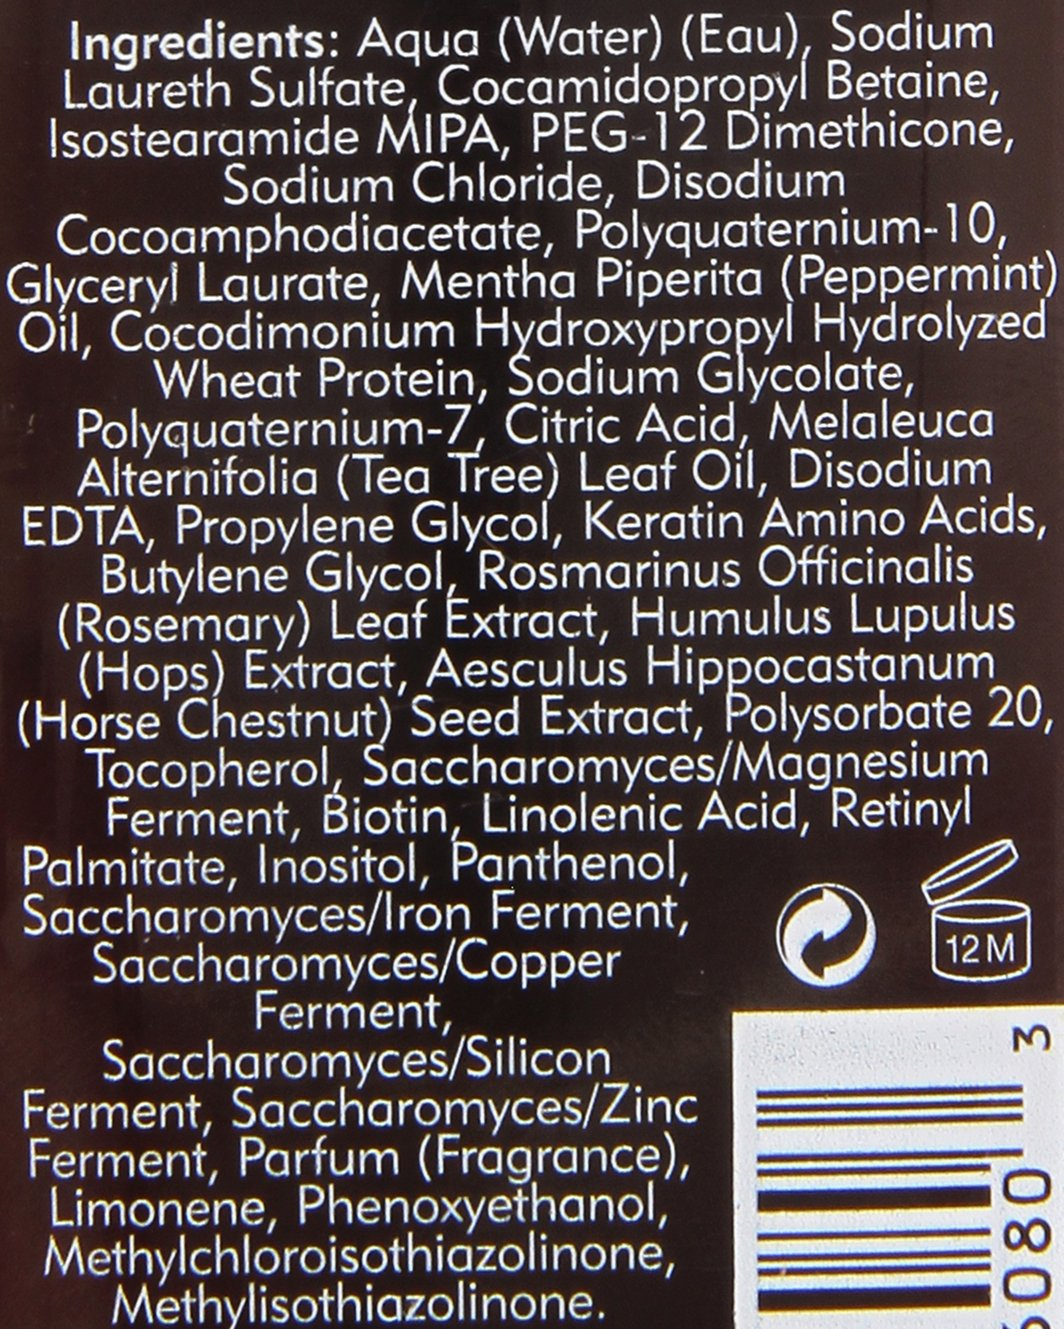 Amazon.com : American Crew Anti Hair Loss Thickening Shampoo 8.5 oz : Beauty